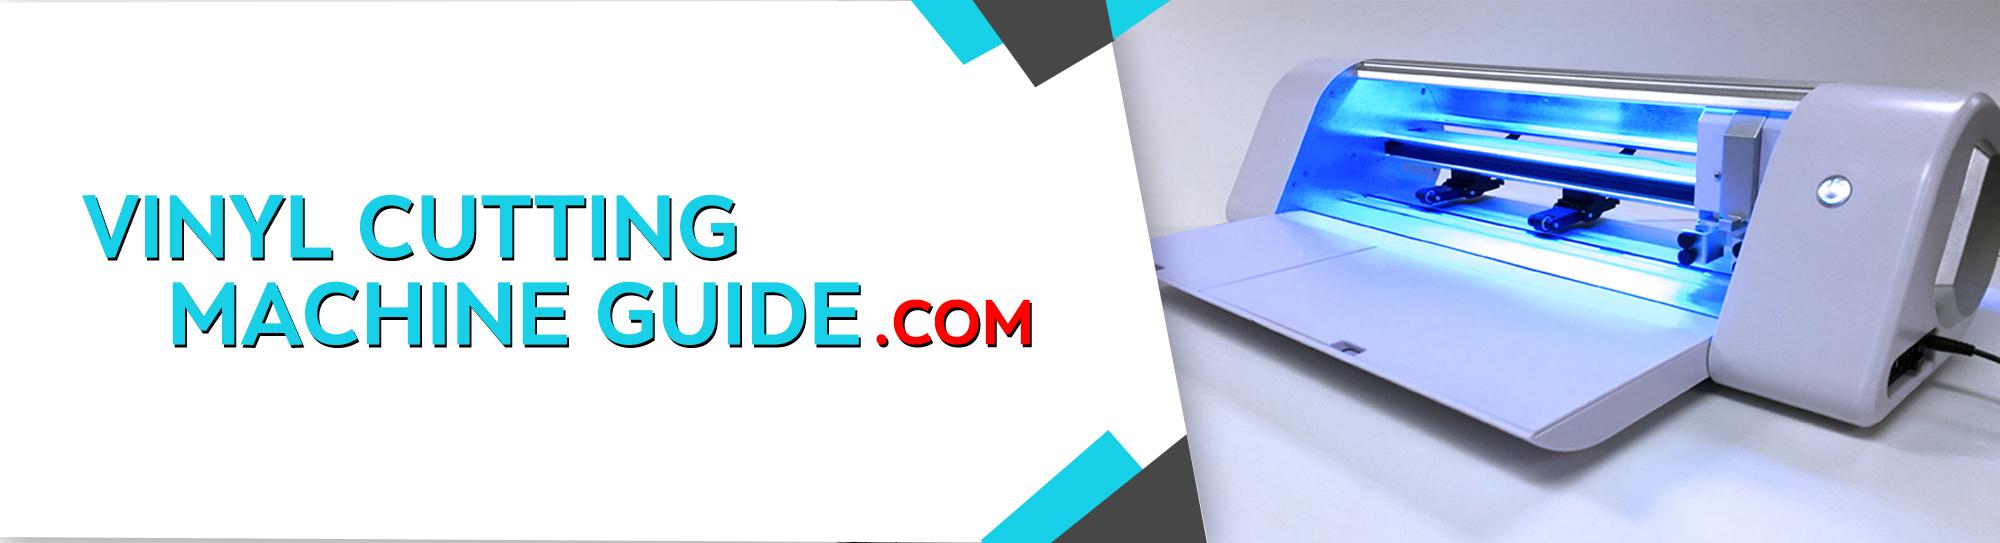 Cricut Explore Air Wireless Review - Vinyl Cutting Machine Guide